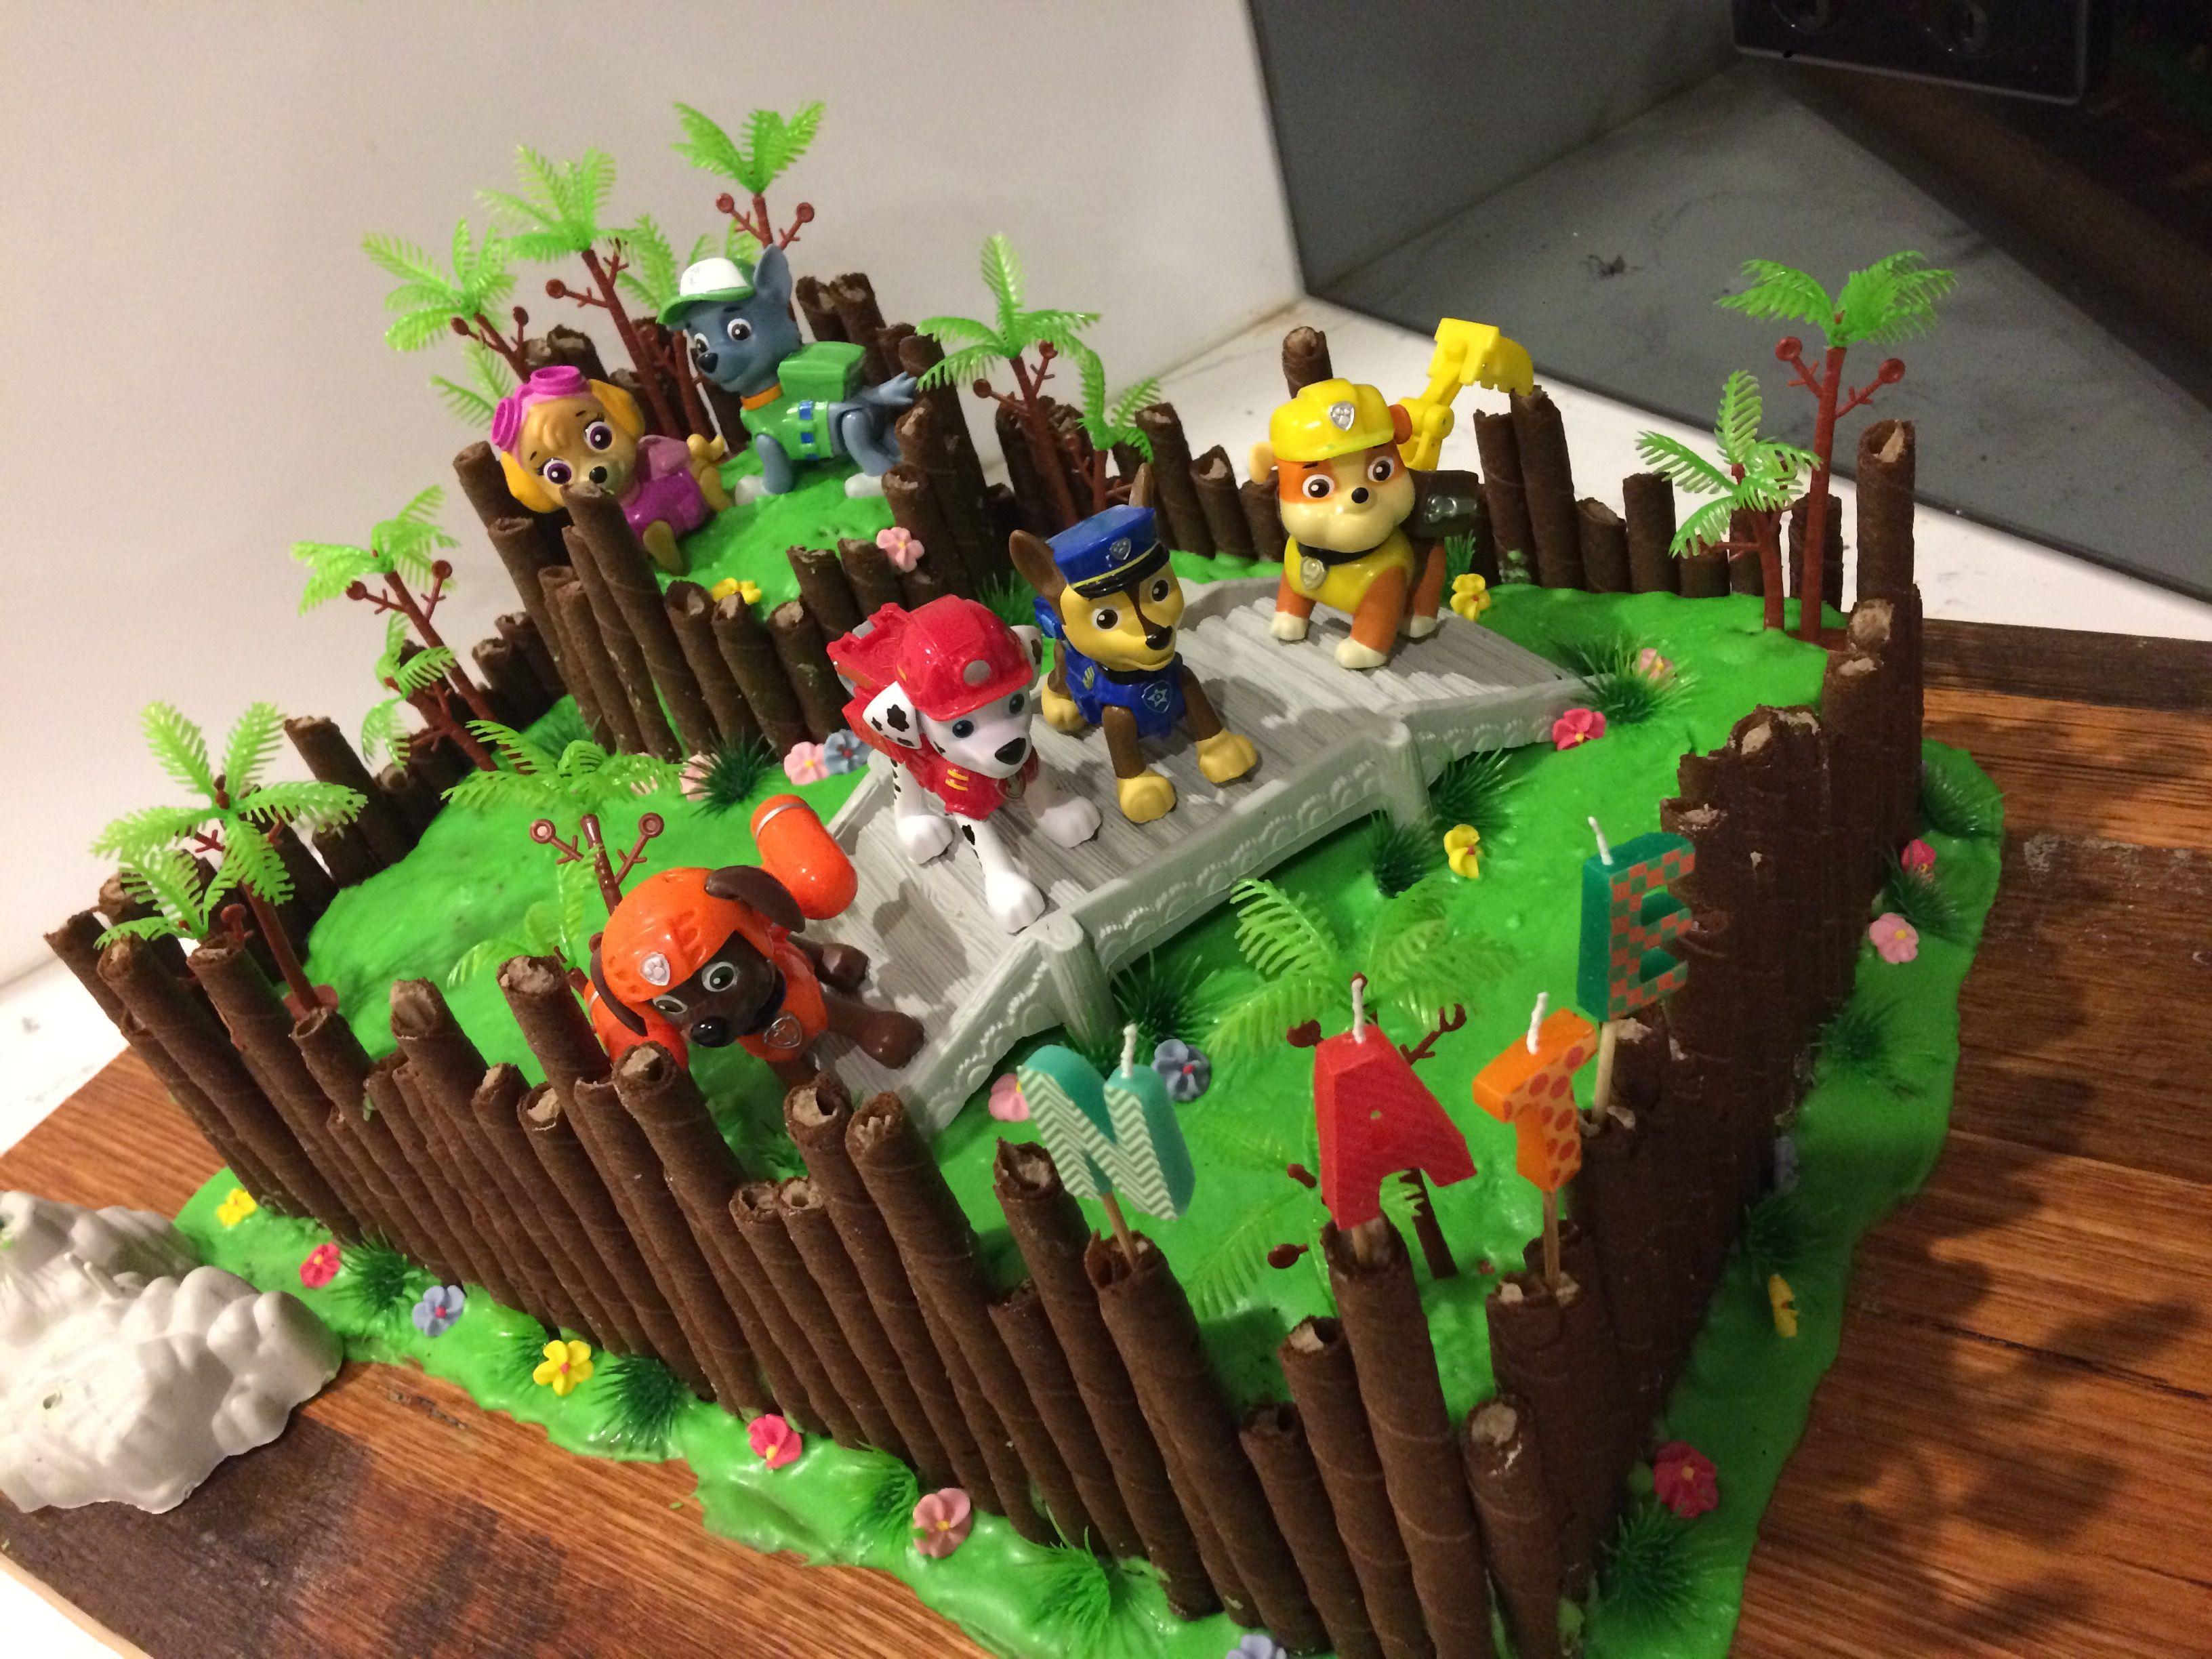 Paw patrol jungle cake kindergeburtstag geburtstag geburt - Geburtstagsideen zum 90 ...